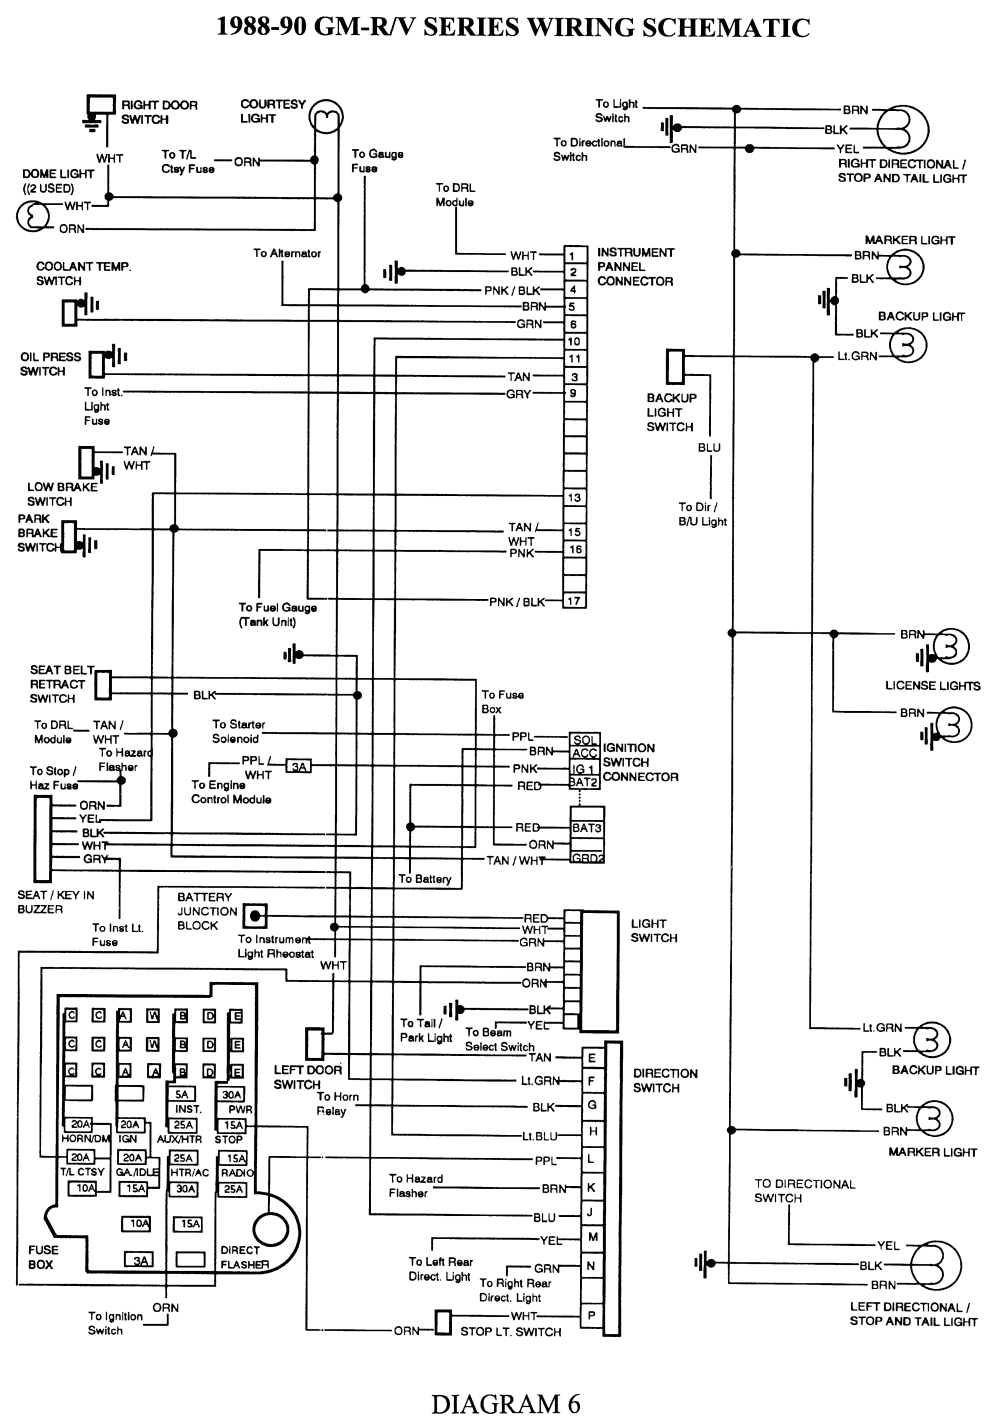 2005 Chevy Silverado Brake Light Wiring Diagram Repair Guides Wiring Diagrams Wiring Diagrams Autozone Com